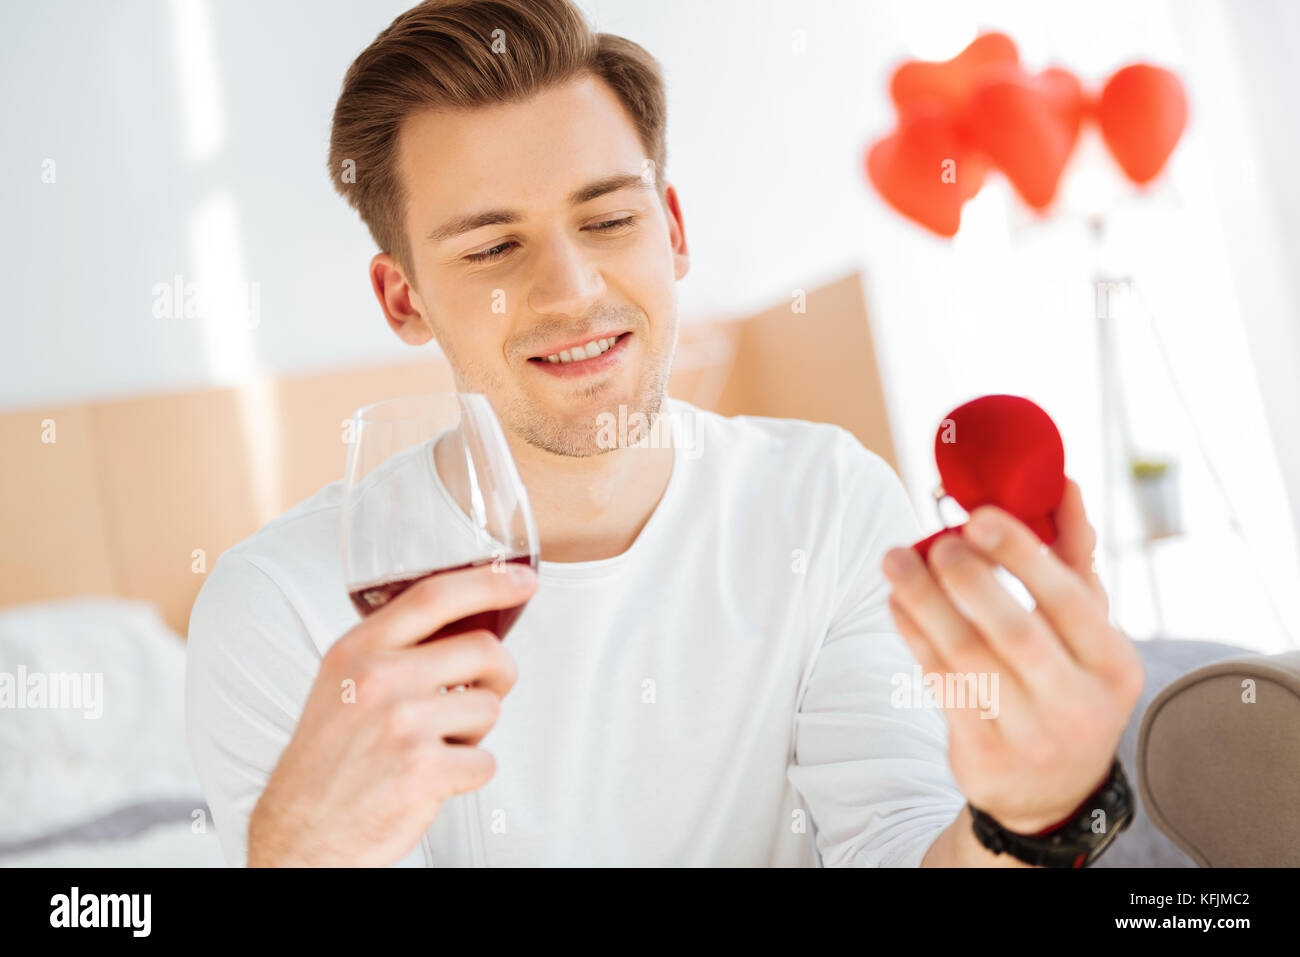 Relajado Joven mirando Engagement Ring Imagen De Stock